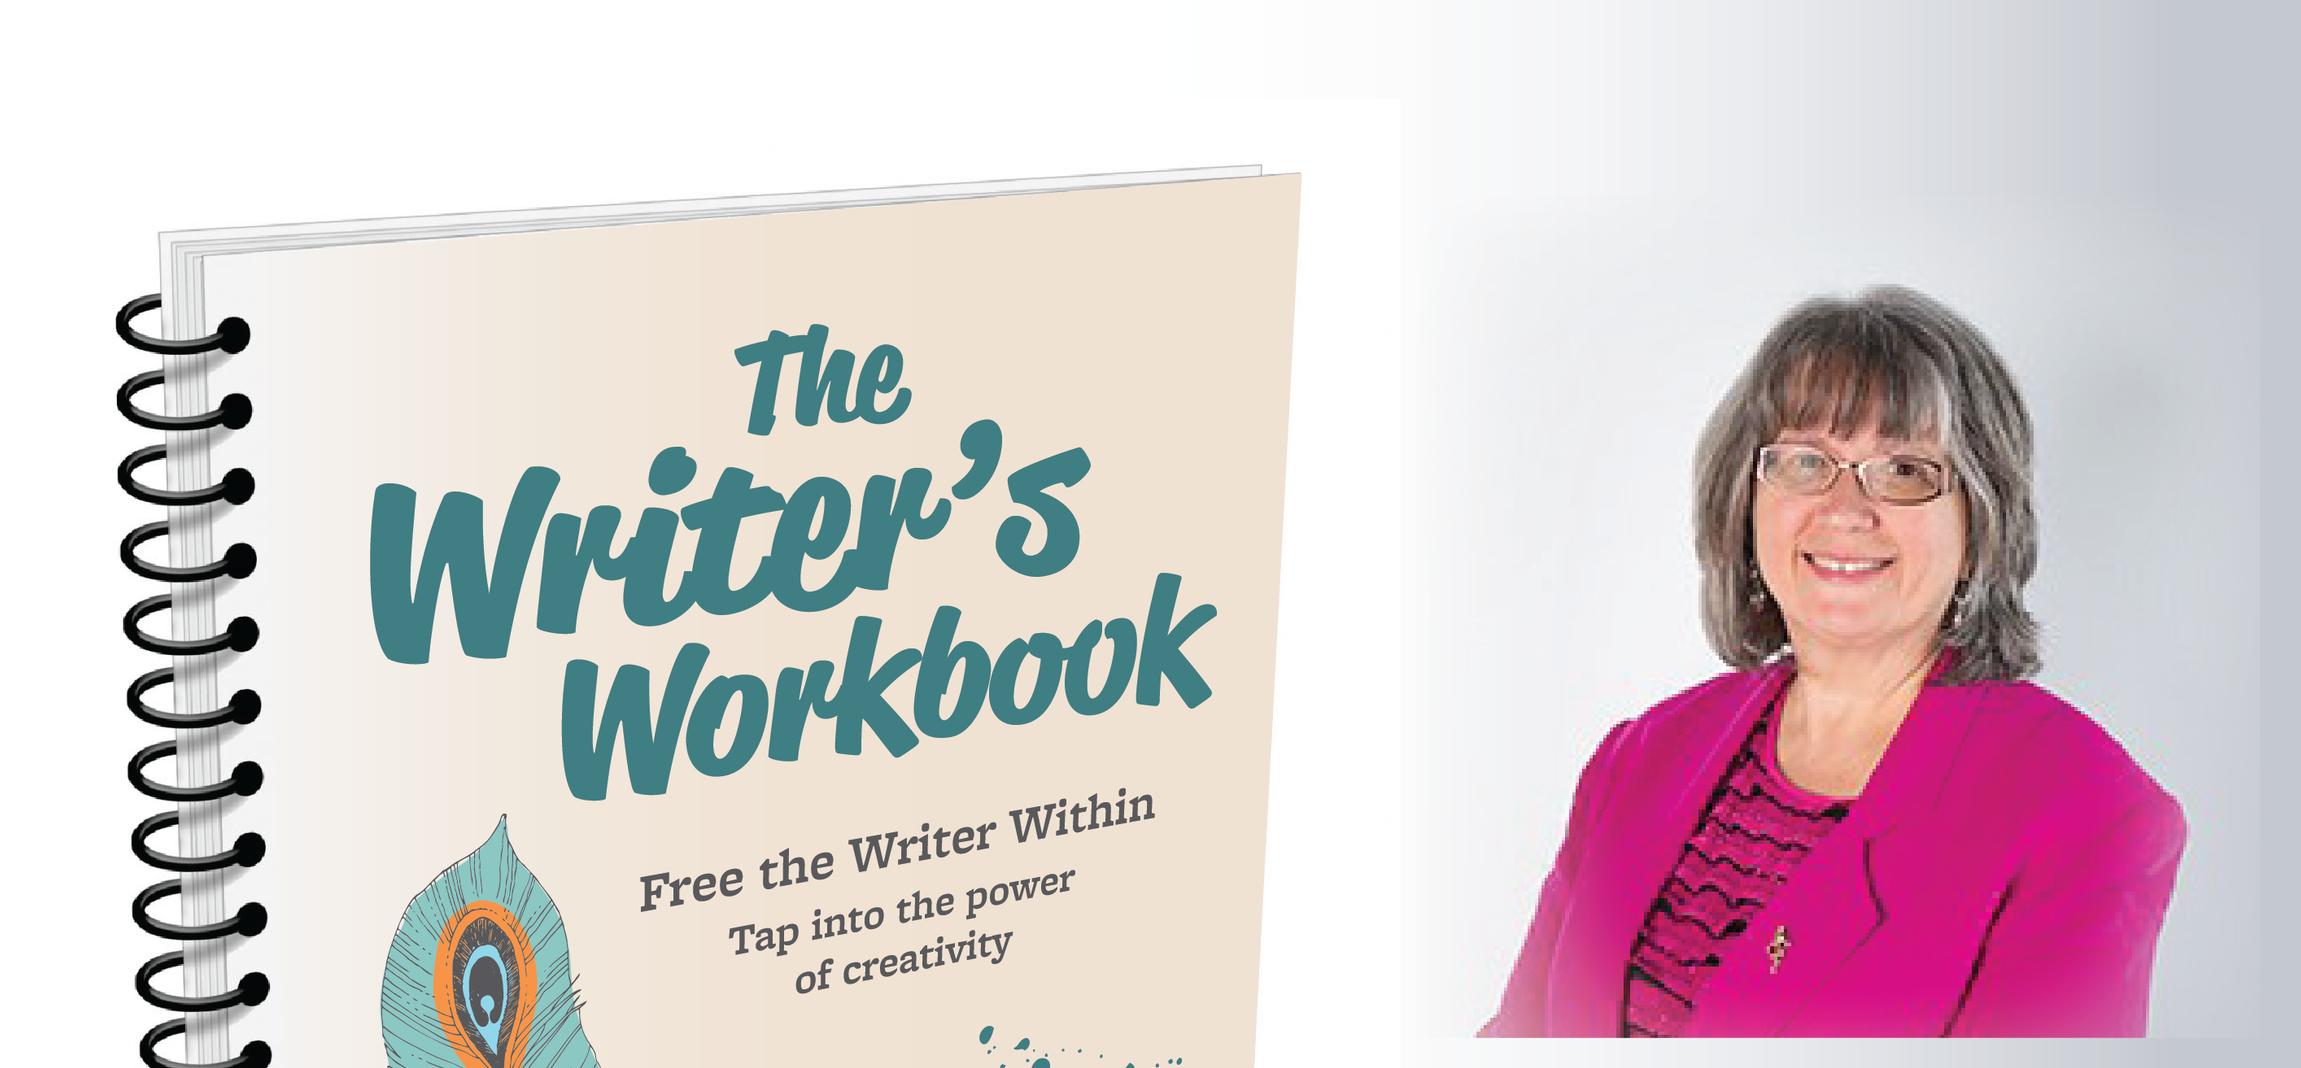 THE WRITER'S WORKBOOK | SUSAN KSIEZOPOLSKI